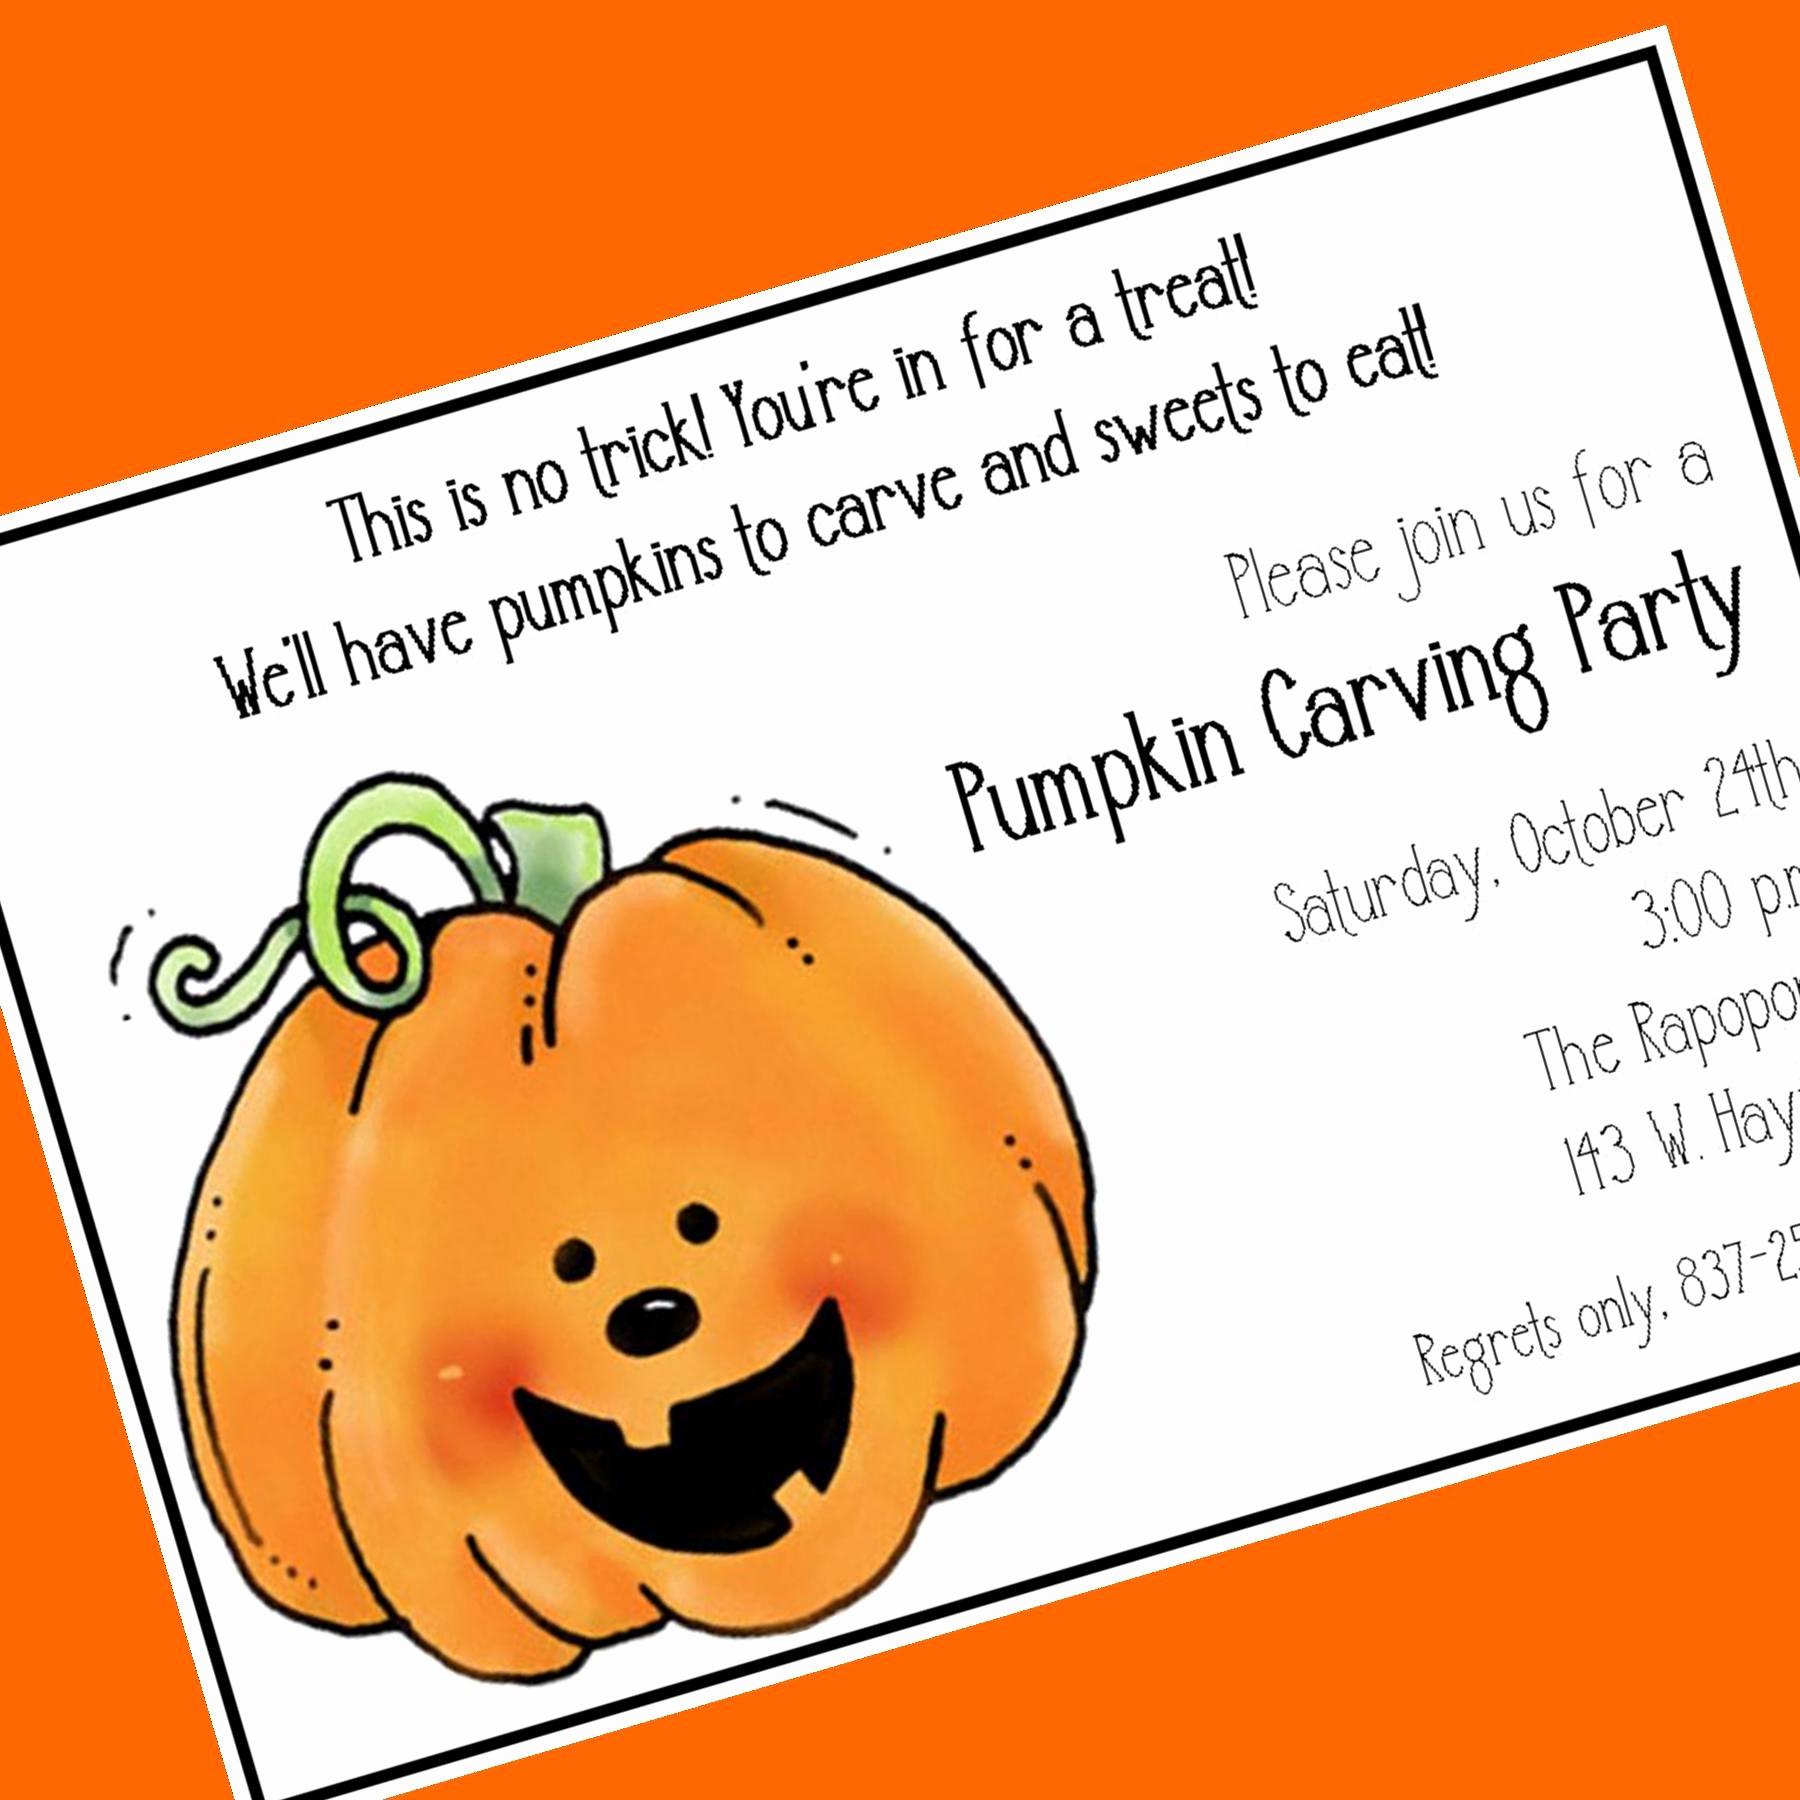 Pumpkin Carving Party Invitation Inspirational Pumpkin Carving Party Invitation Custom Wording 12